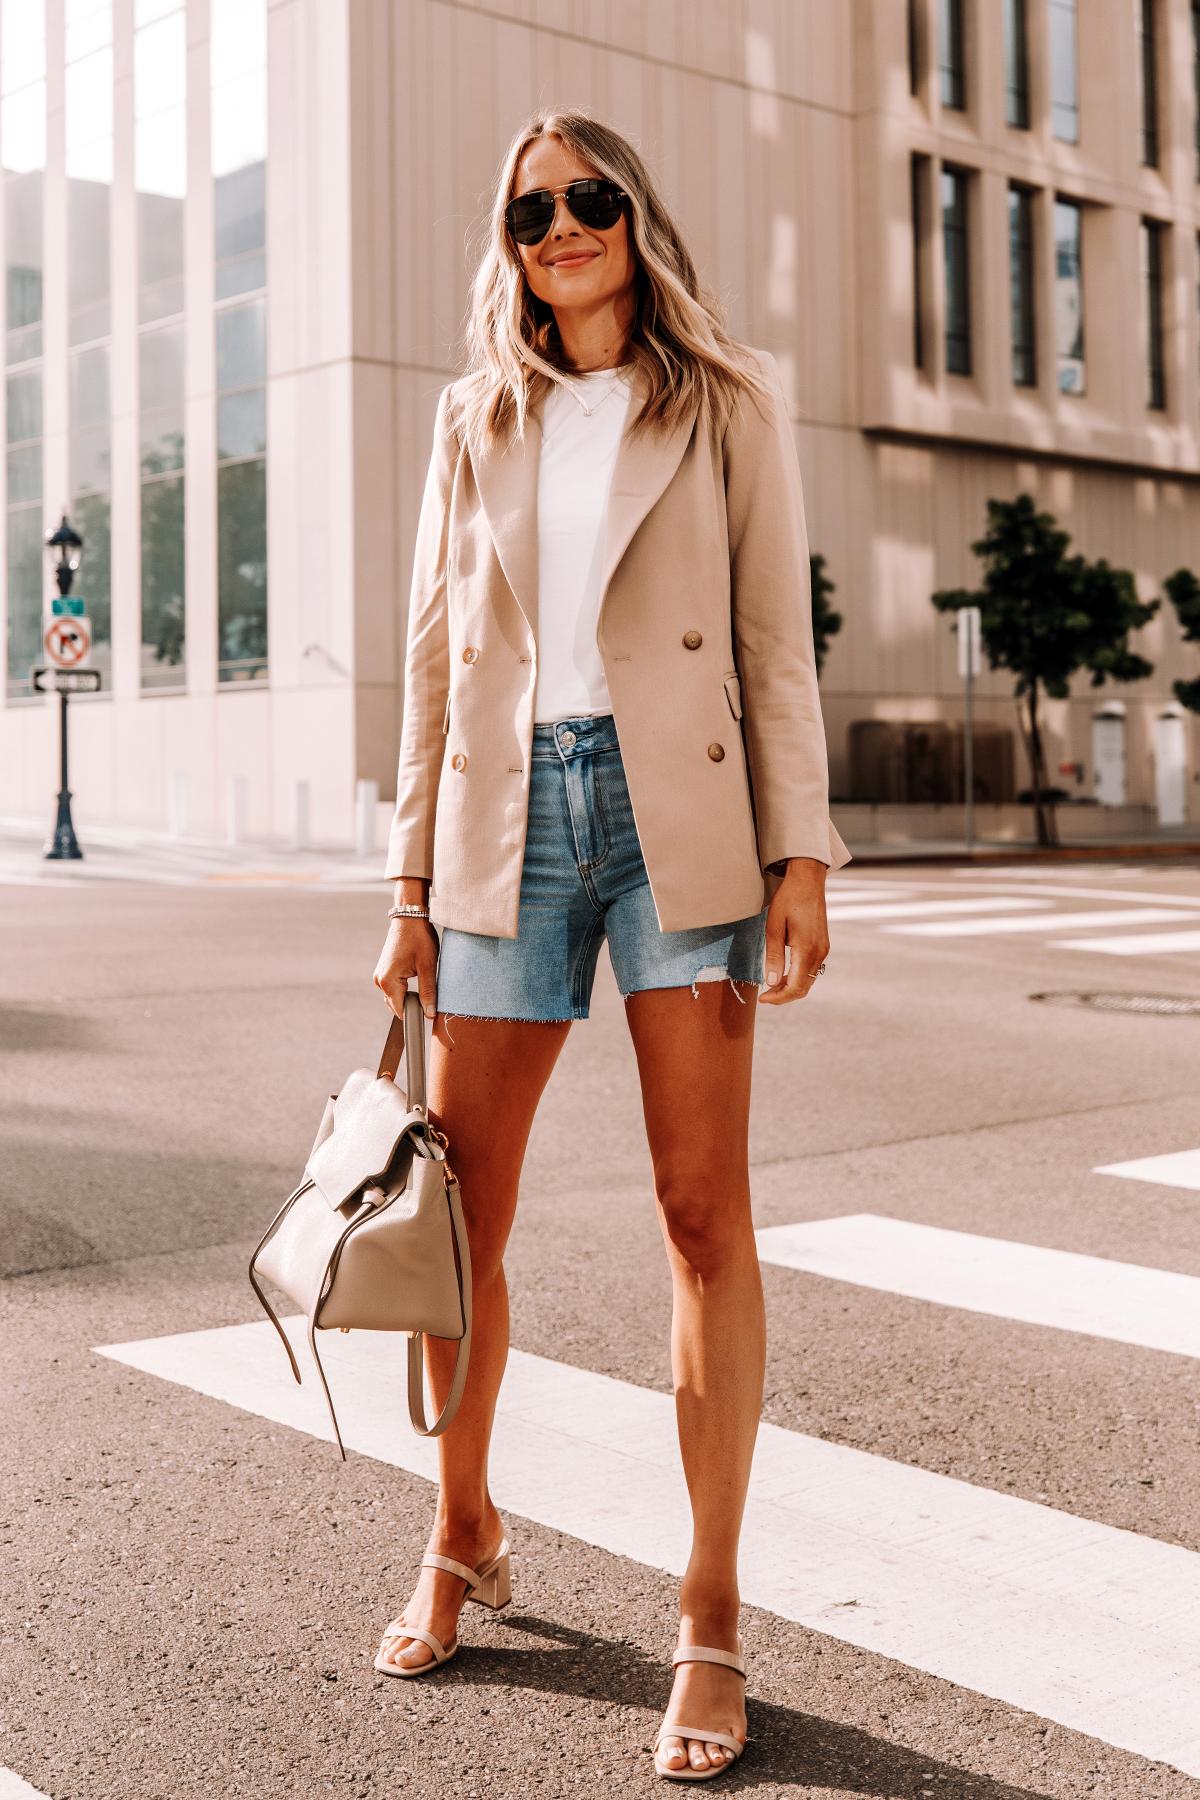 Fashion Jackson Wearing Tan Blazer White Tshirt Raw Hem Denim Shorts Tan Sandals Celine Belt Bag 2